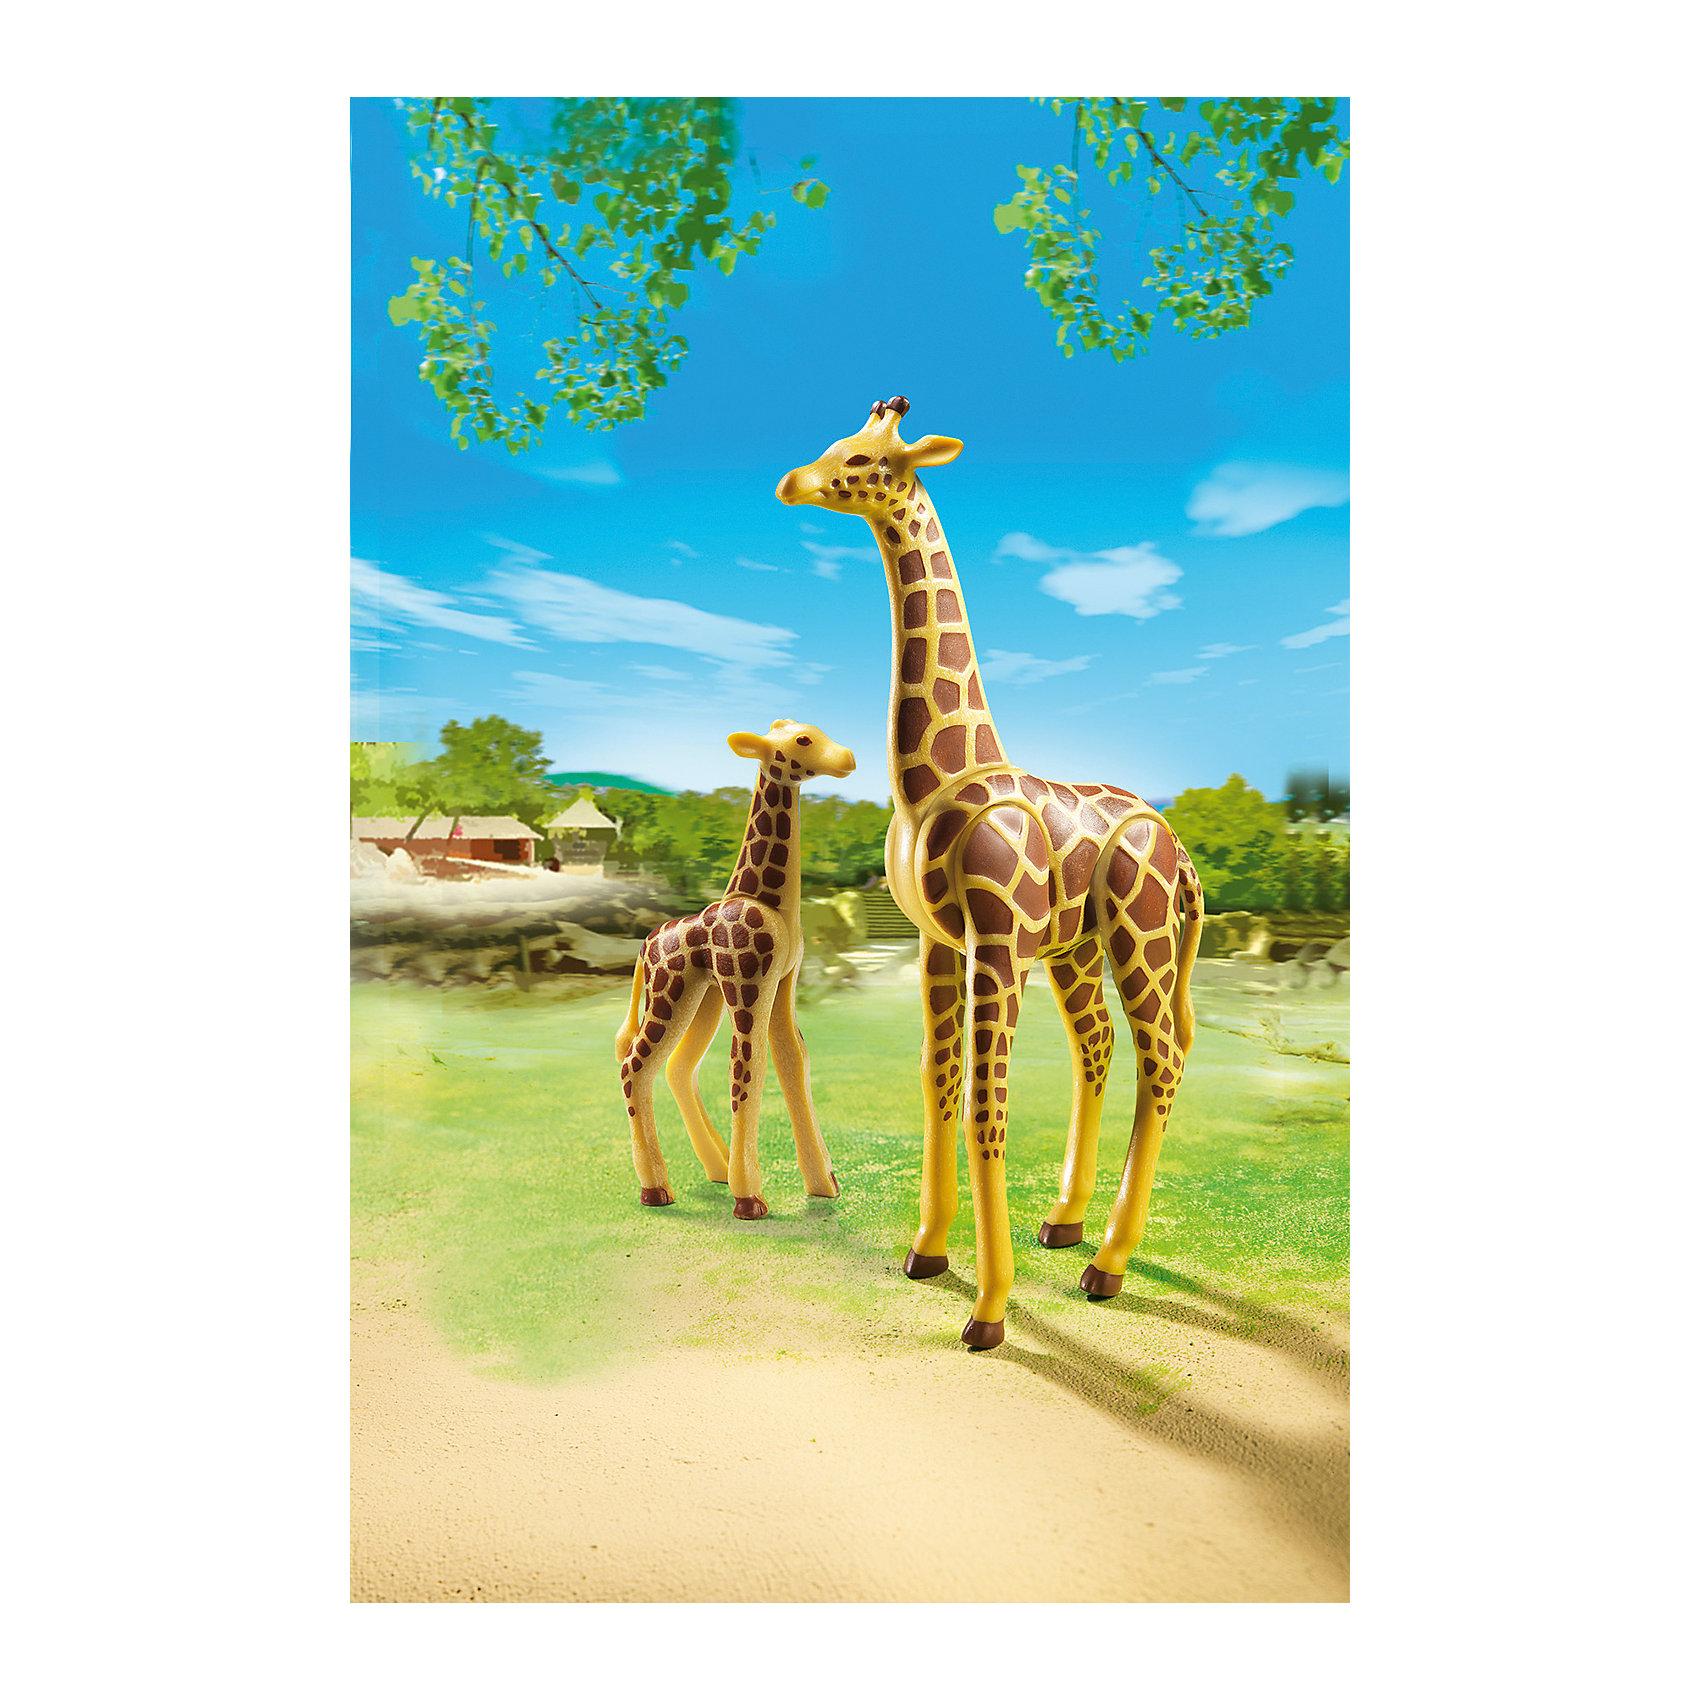 PLAYMOBIL® Зоопарк: Жираф со своим детенышем жирафом, PLAYMOBIL playmobil® playmobil 5546 парк развлечений продавец шаров smileyworld